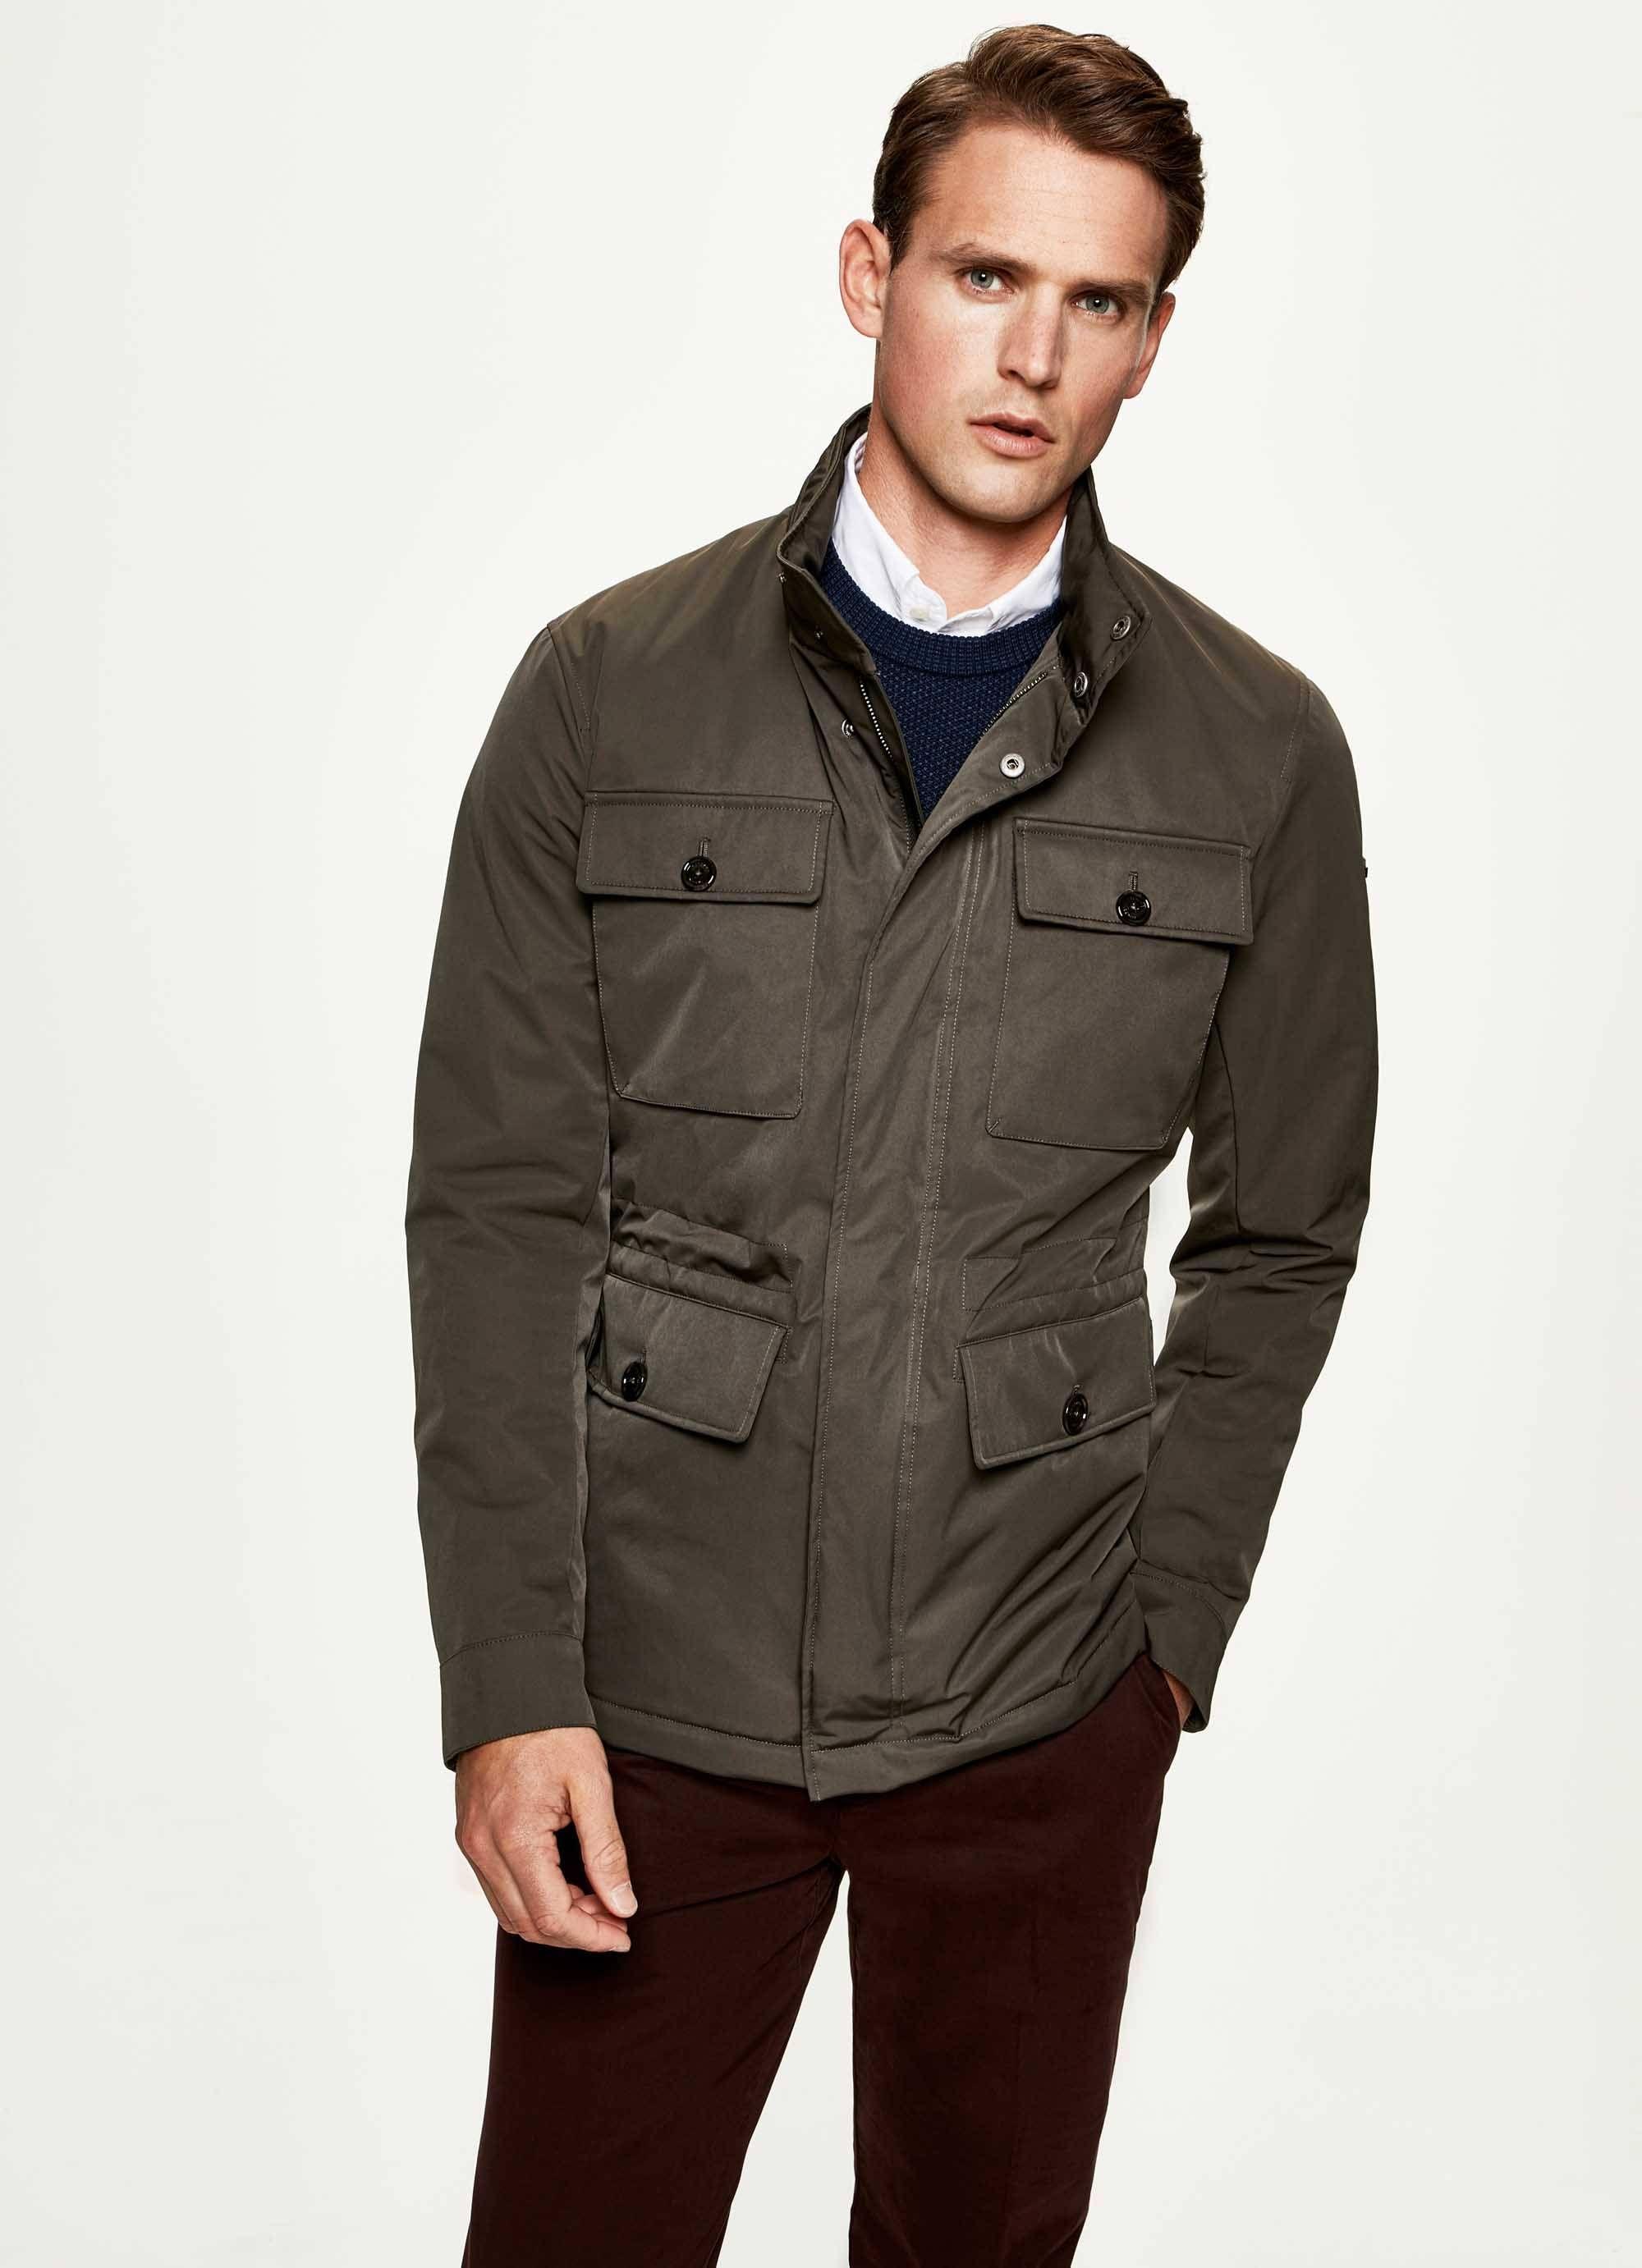 Pin by John Todd on Rugged Jackets Jackets, Field jacket